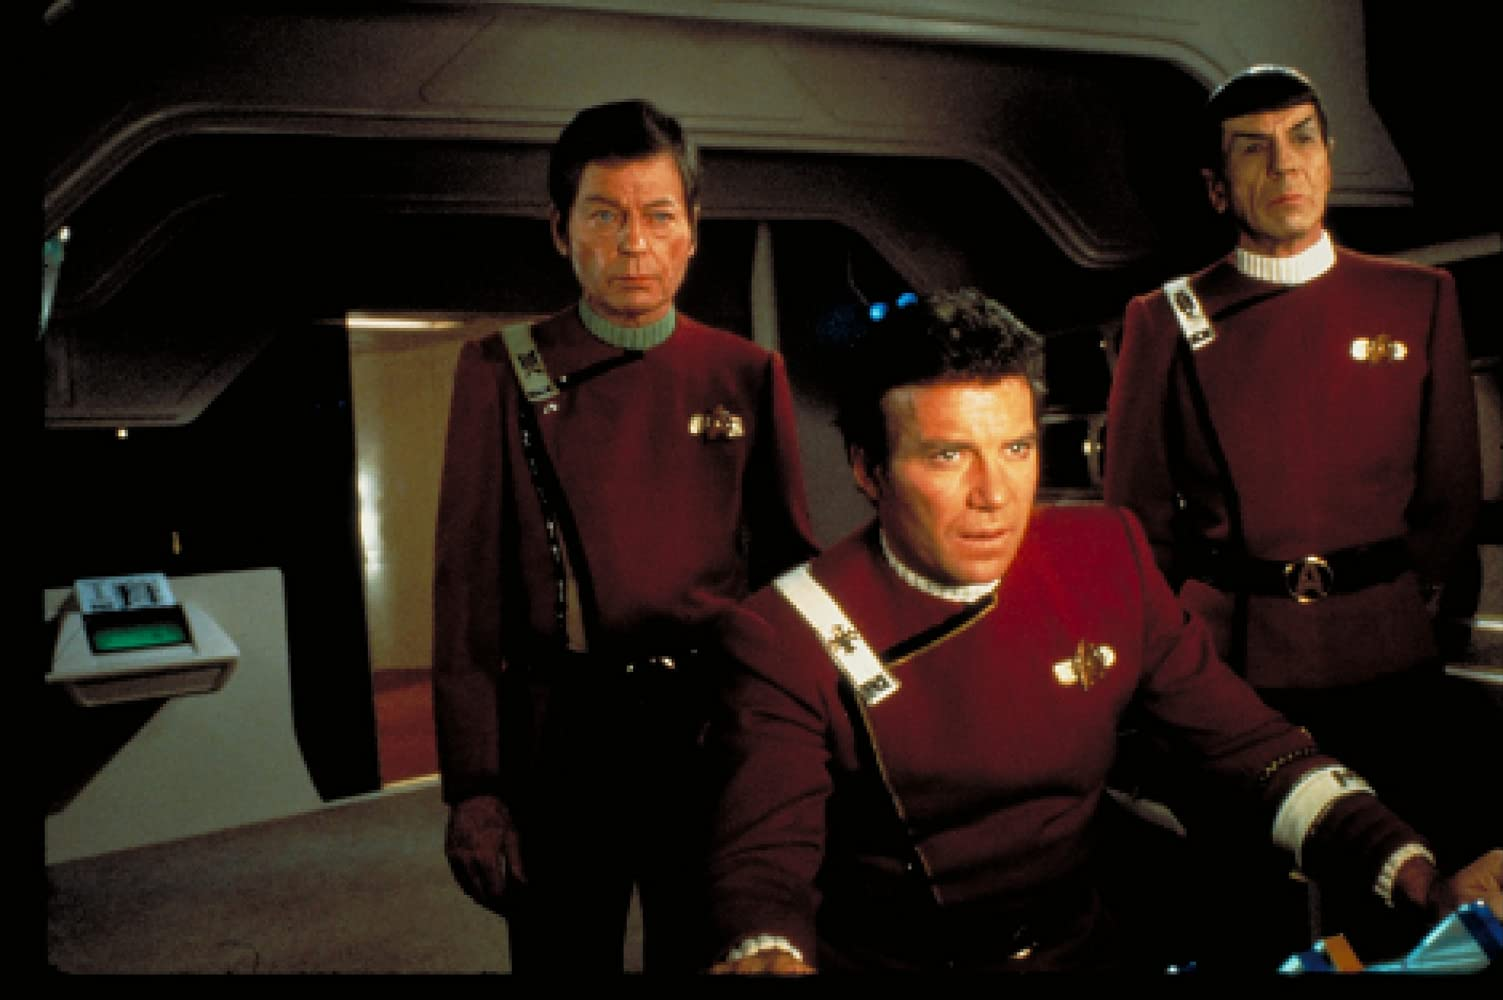 Leonard Nimoy, William Shatner, and DeForest Kelley in Star Trek II: The Wrath of Khan (1982)